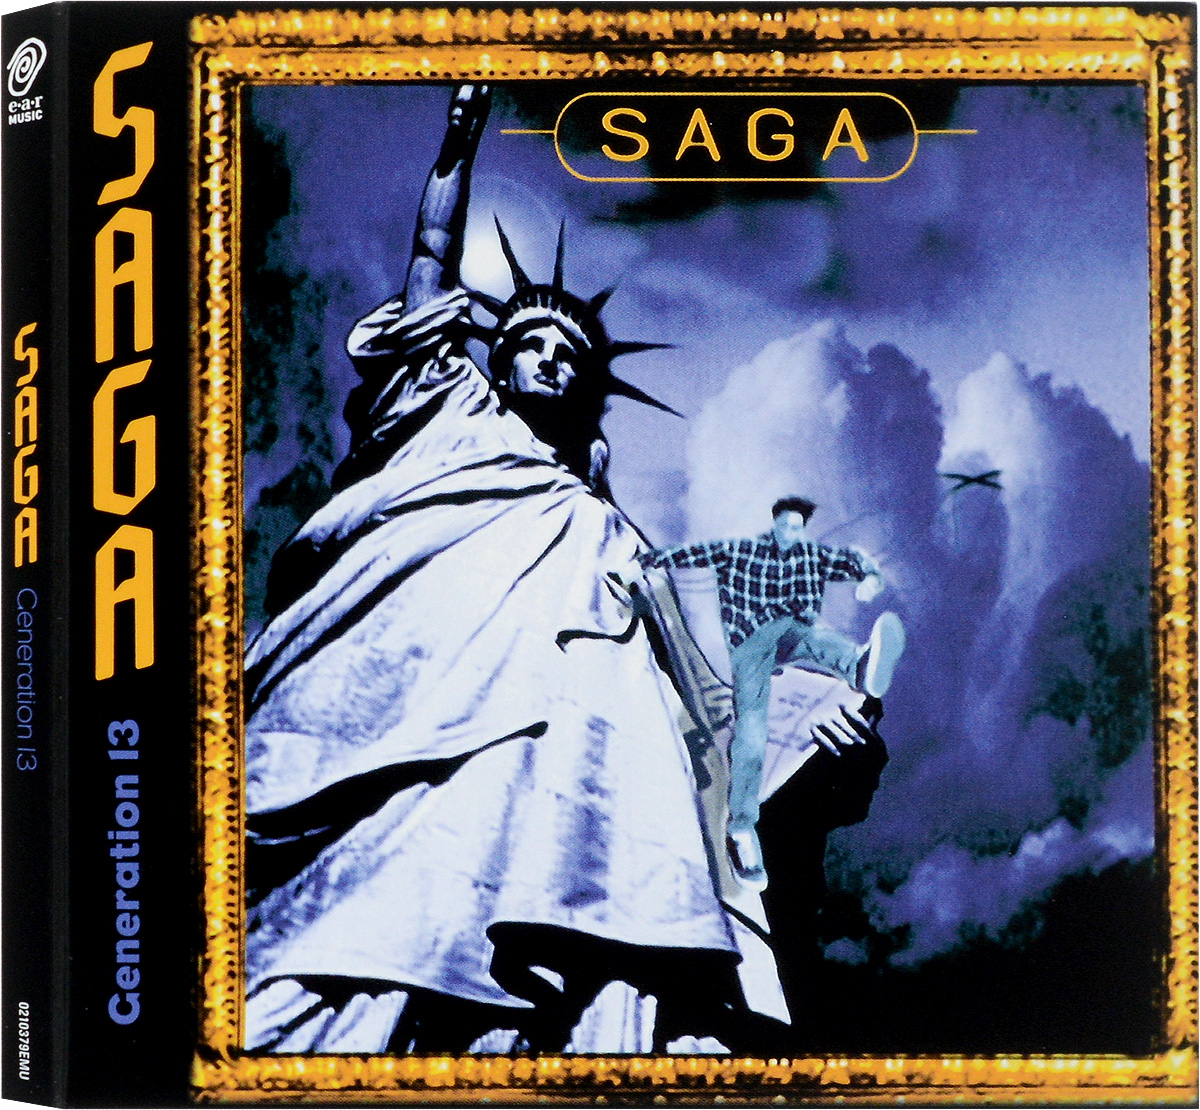 Saga Saga. Generation 13 saga saga steel umbrellas